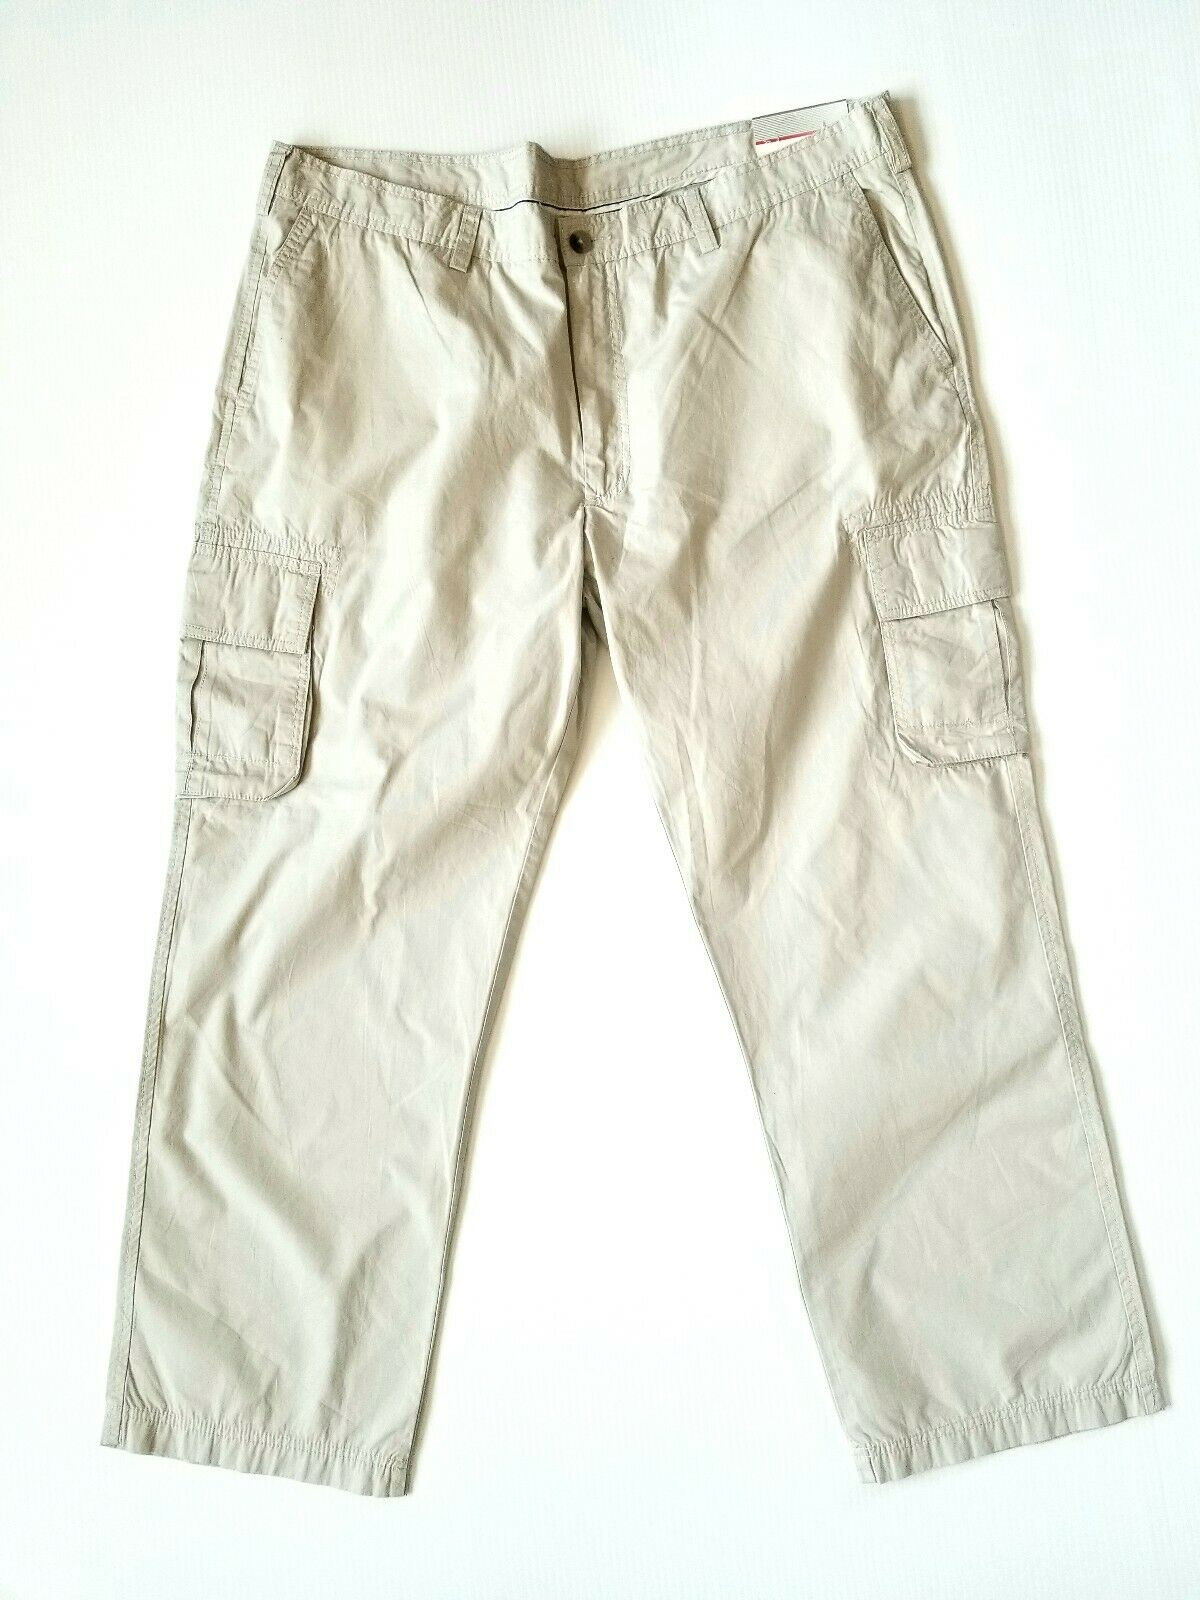 Axist The Slim Cargo Khaki Pants Mens 42 × 30 Dark Chalk